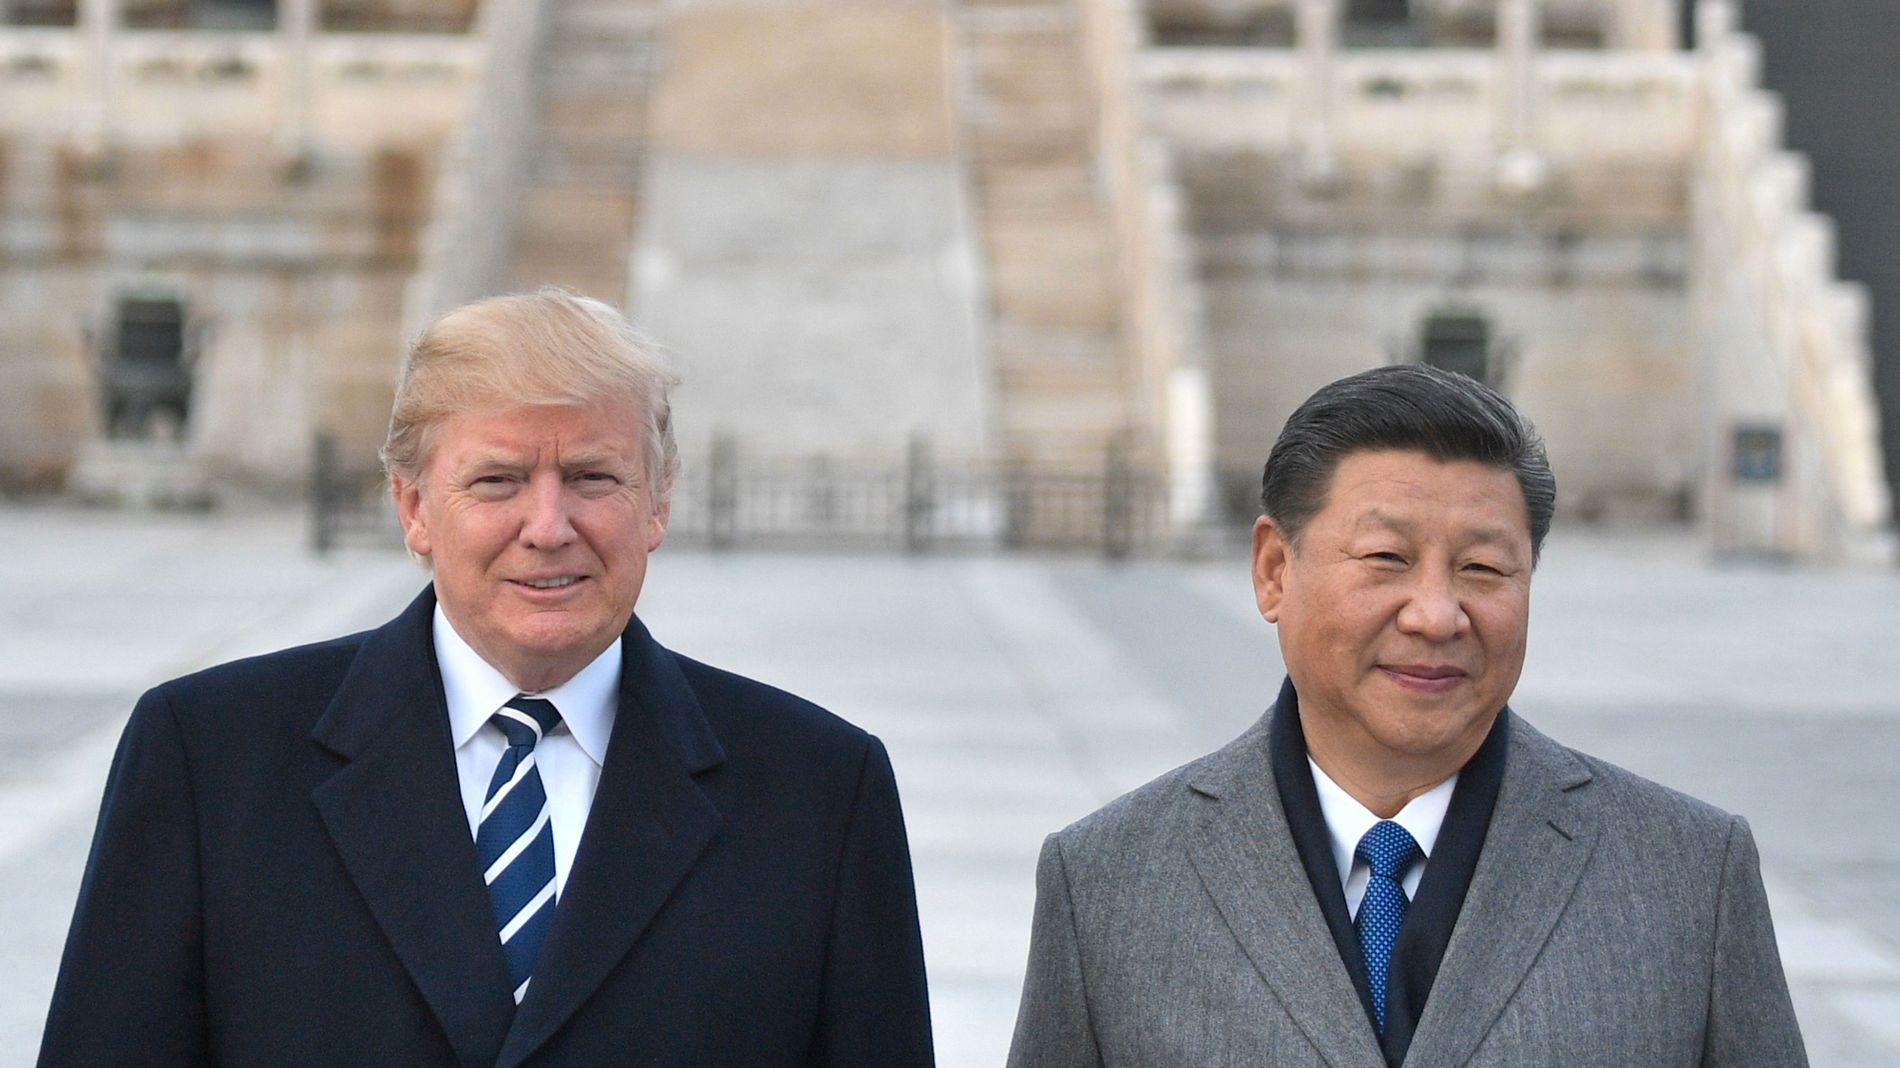 HANDELSKRIGERE: USAs president Donald Trump og Kinas president Xi Jinping sammen i Beijing i fjor.